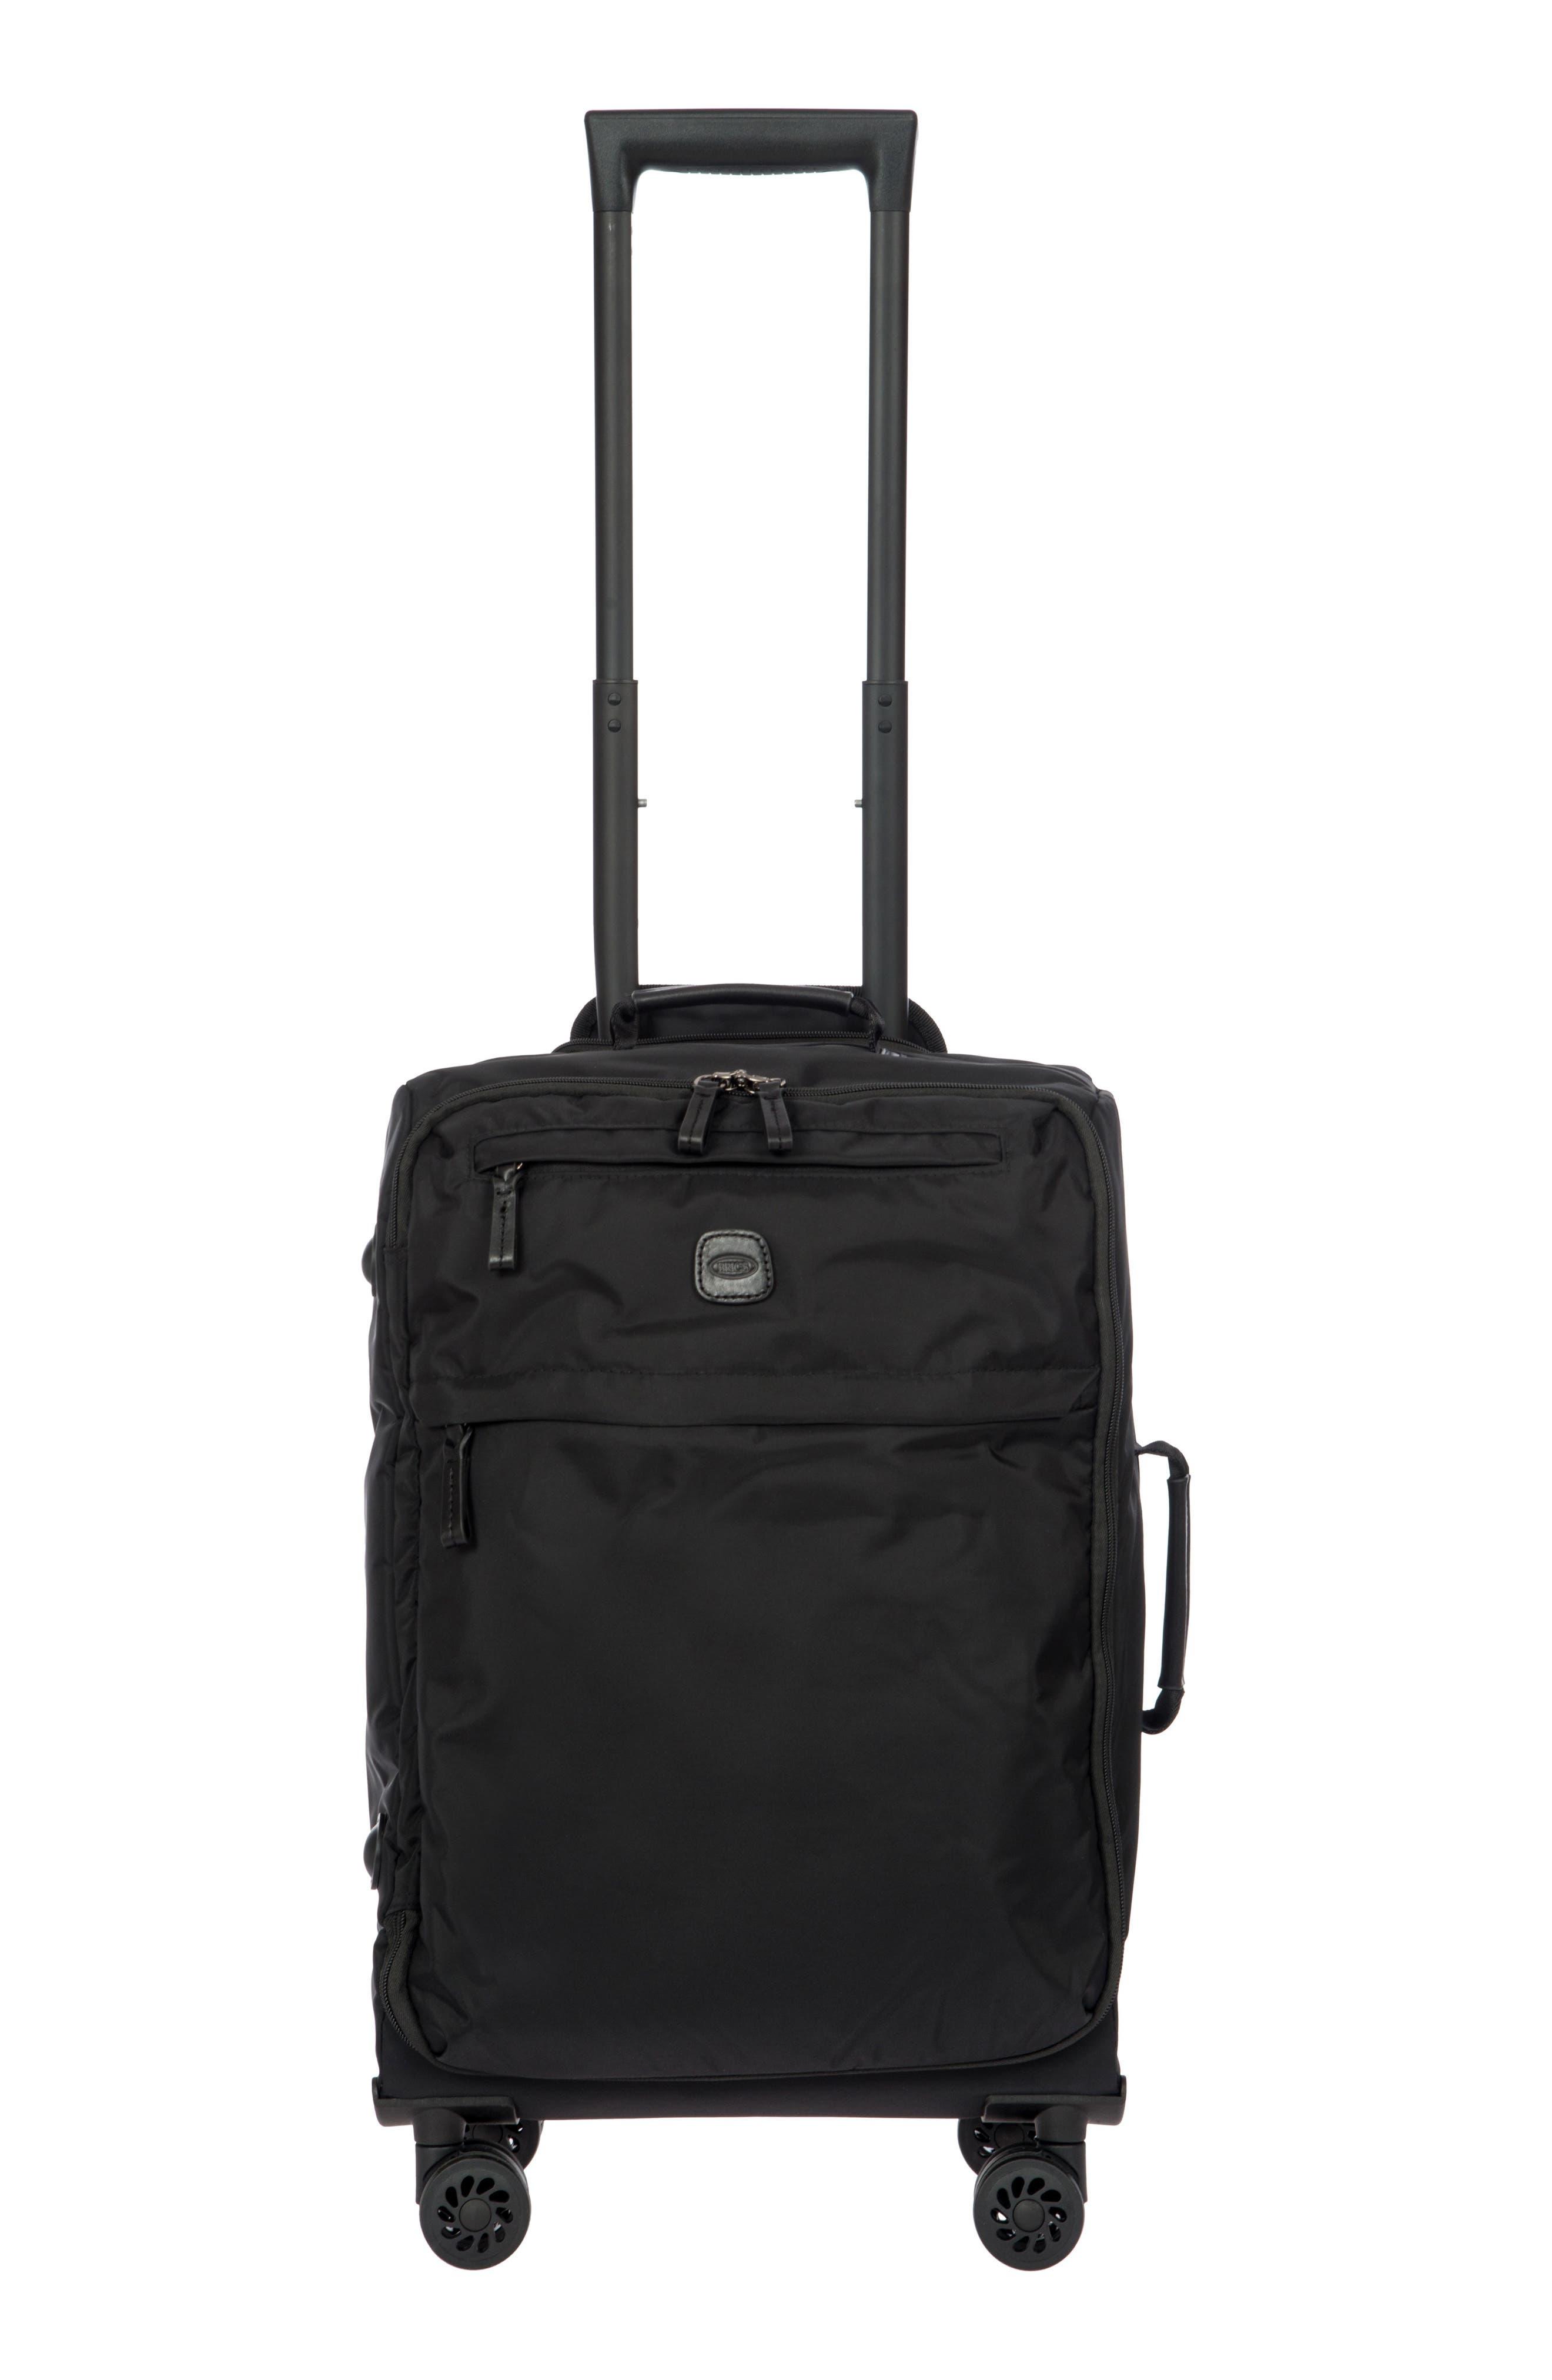 X-Bag 21-Inch Spinner Carry-On,                             Alternate thumbnail 8, color,                             Black/ Black